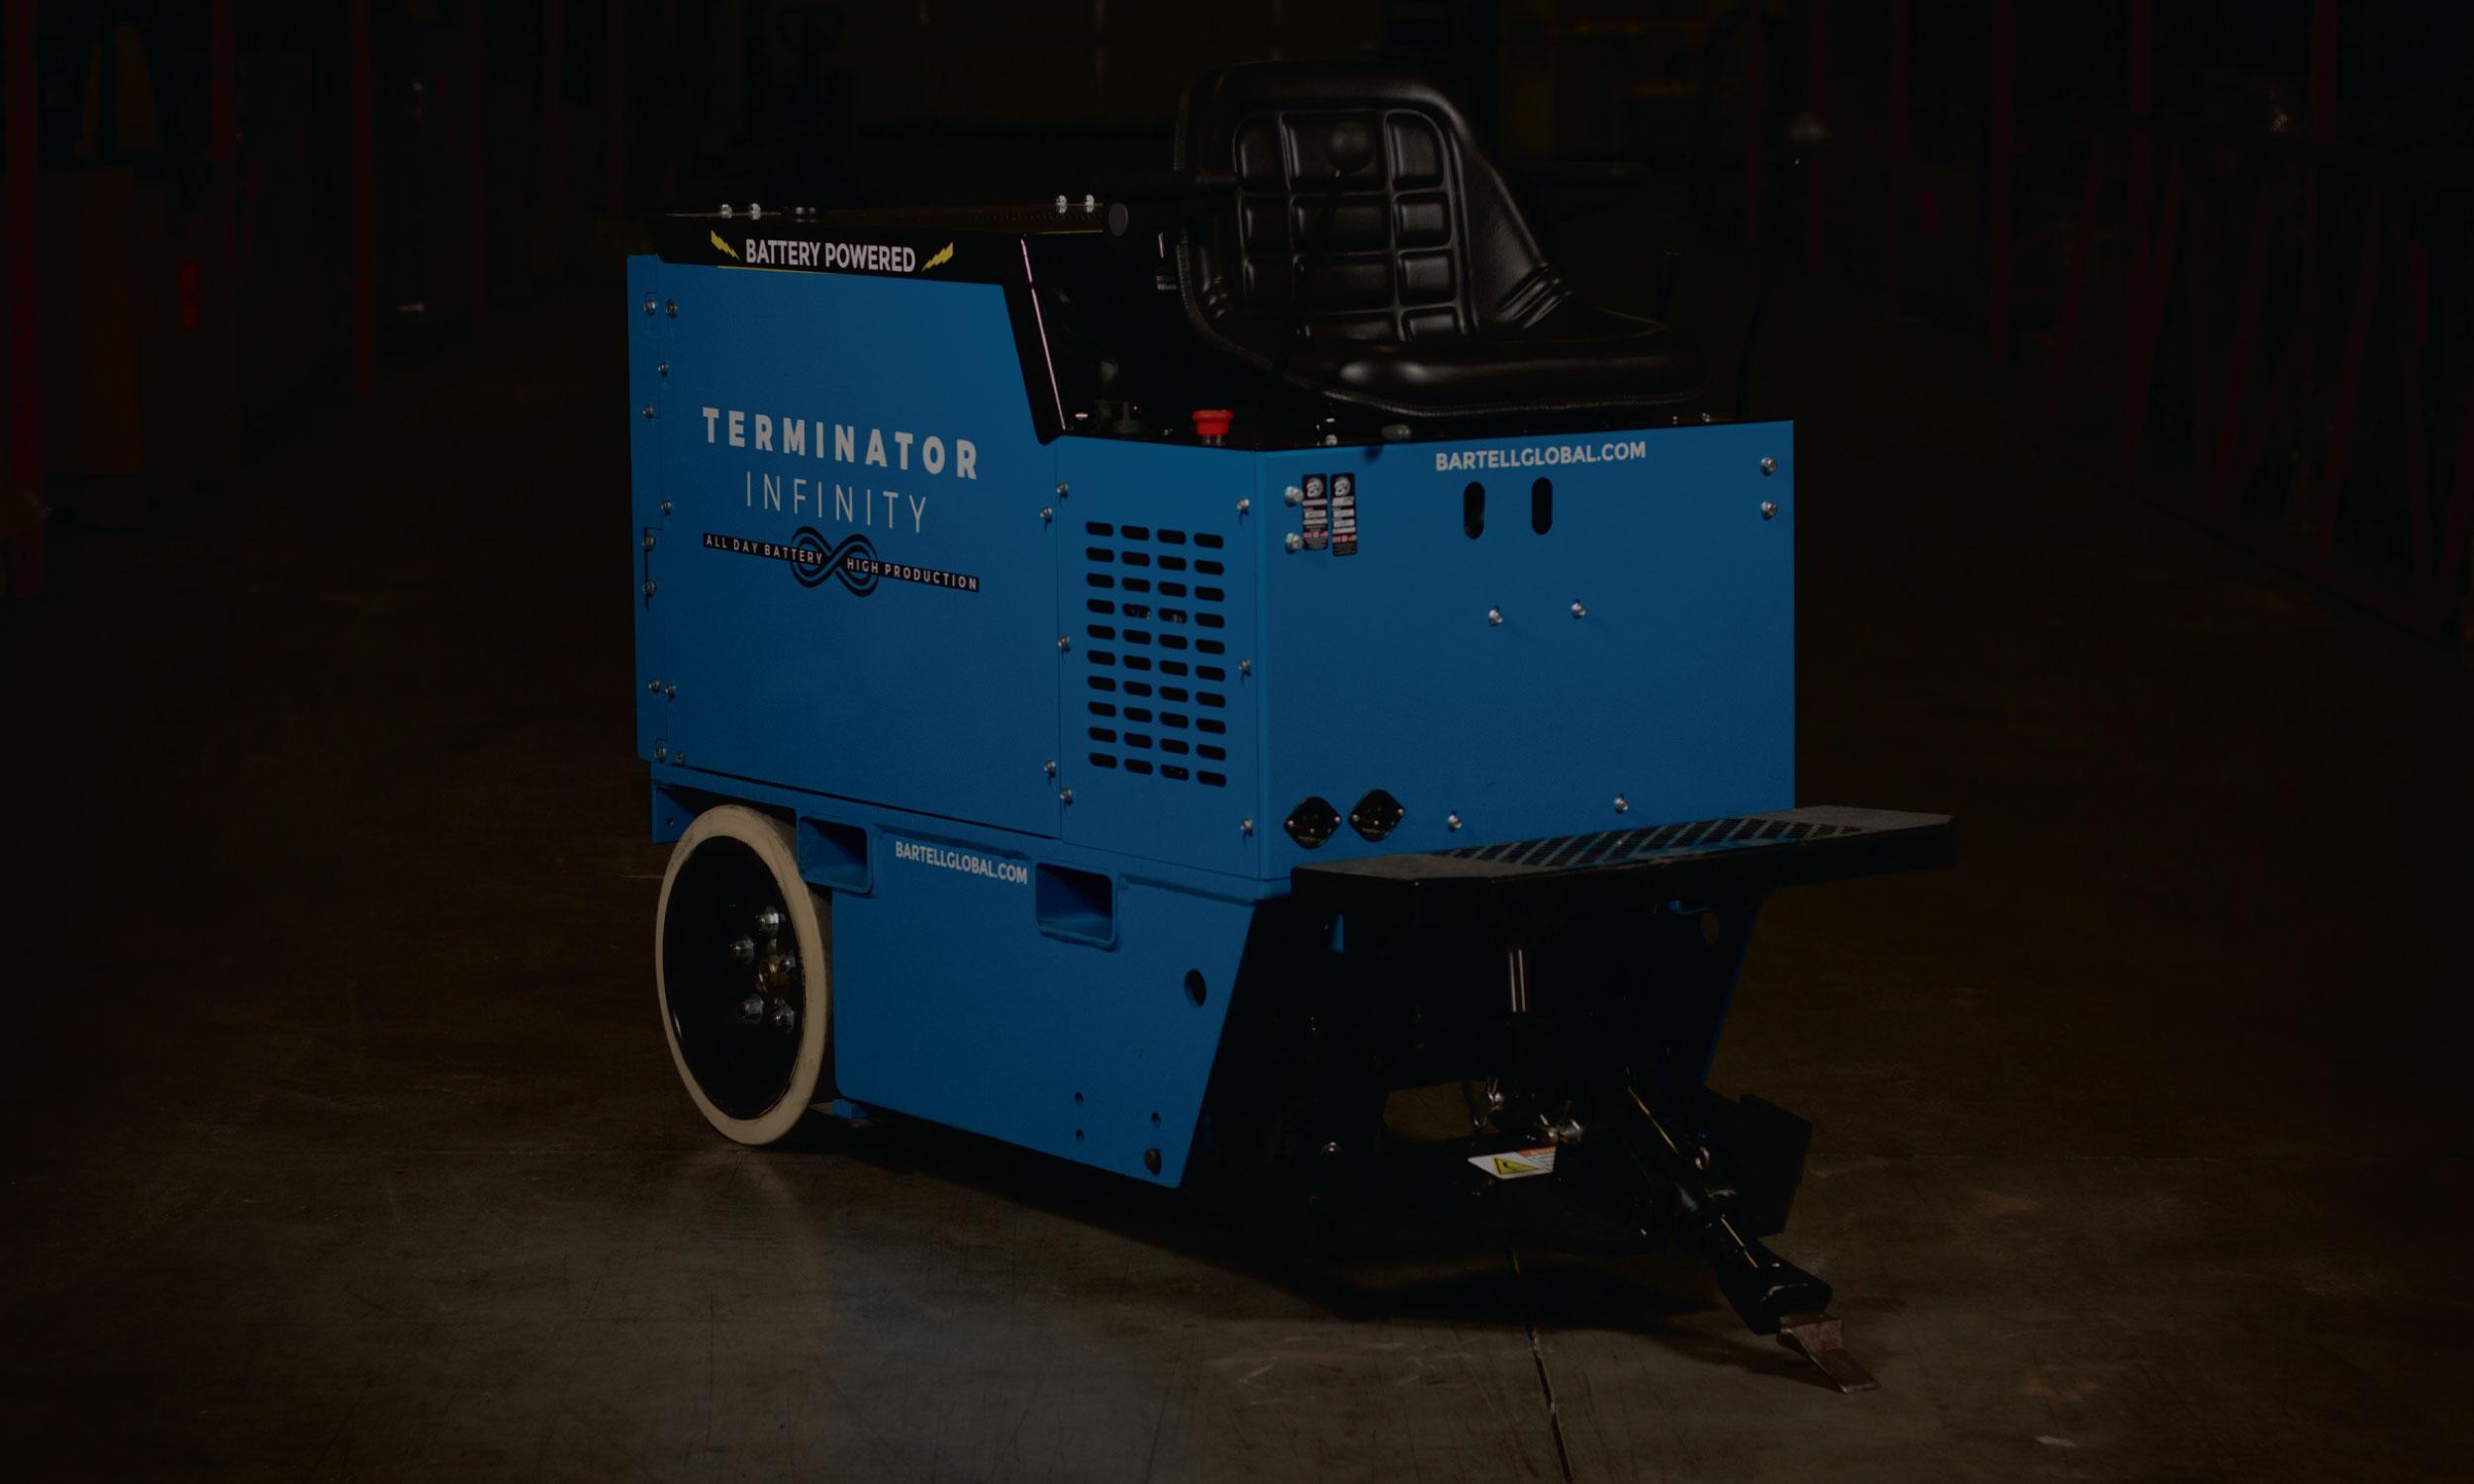 Terminator-Infinity-Ride-on-Floor-Scraper-Hero-Image.jpg